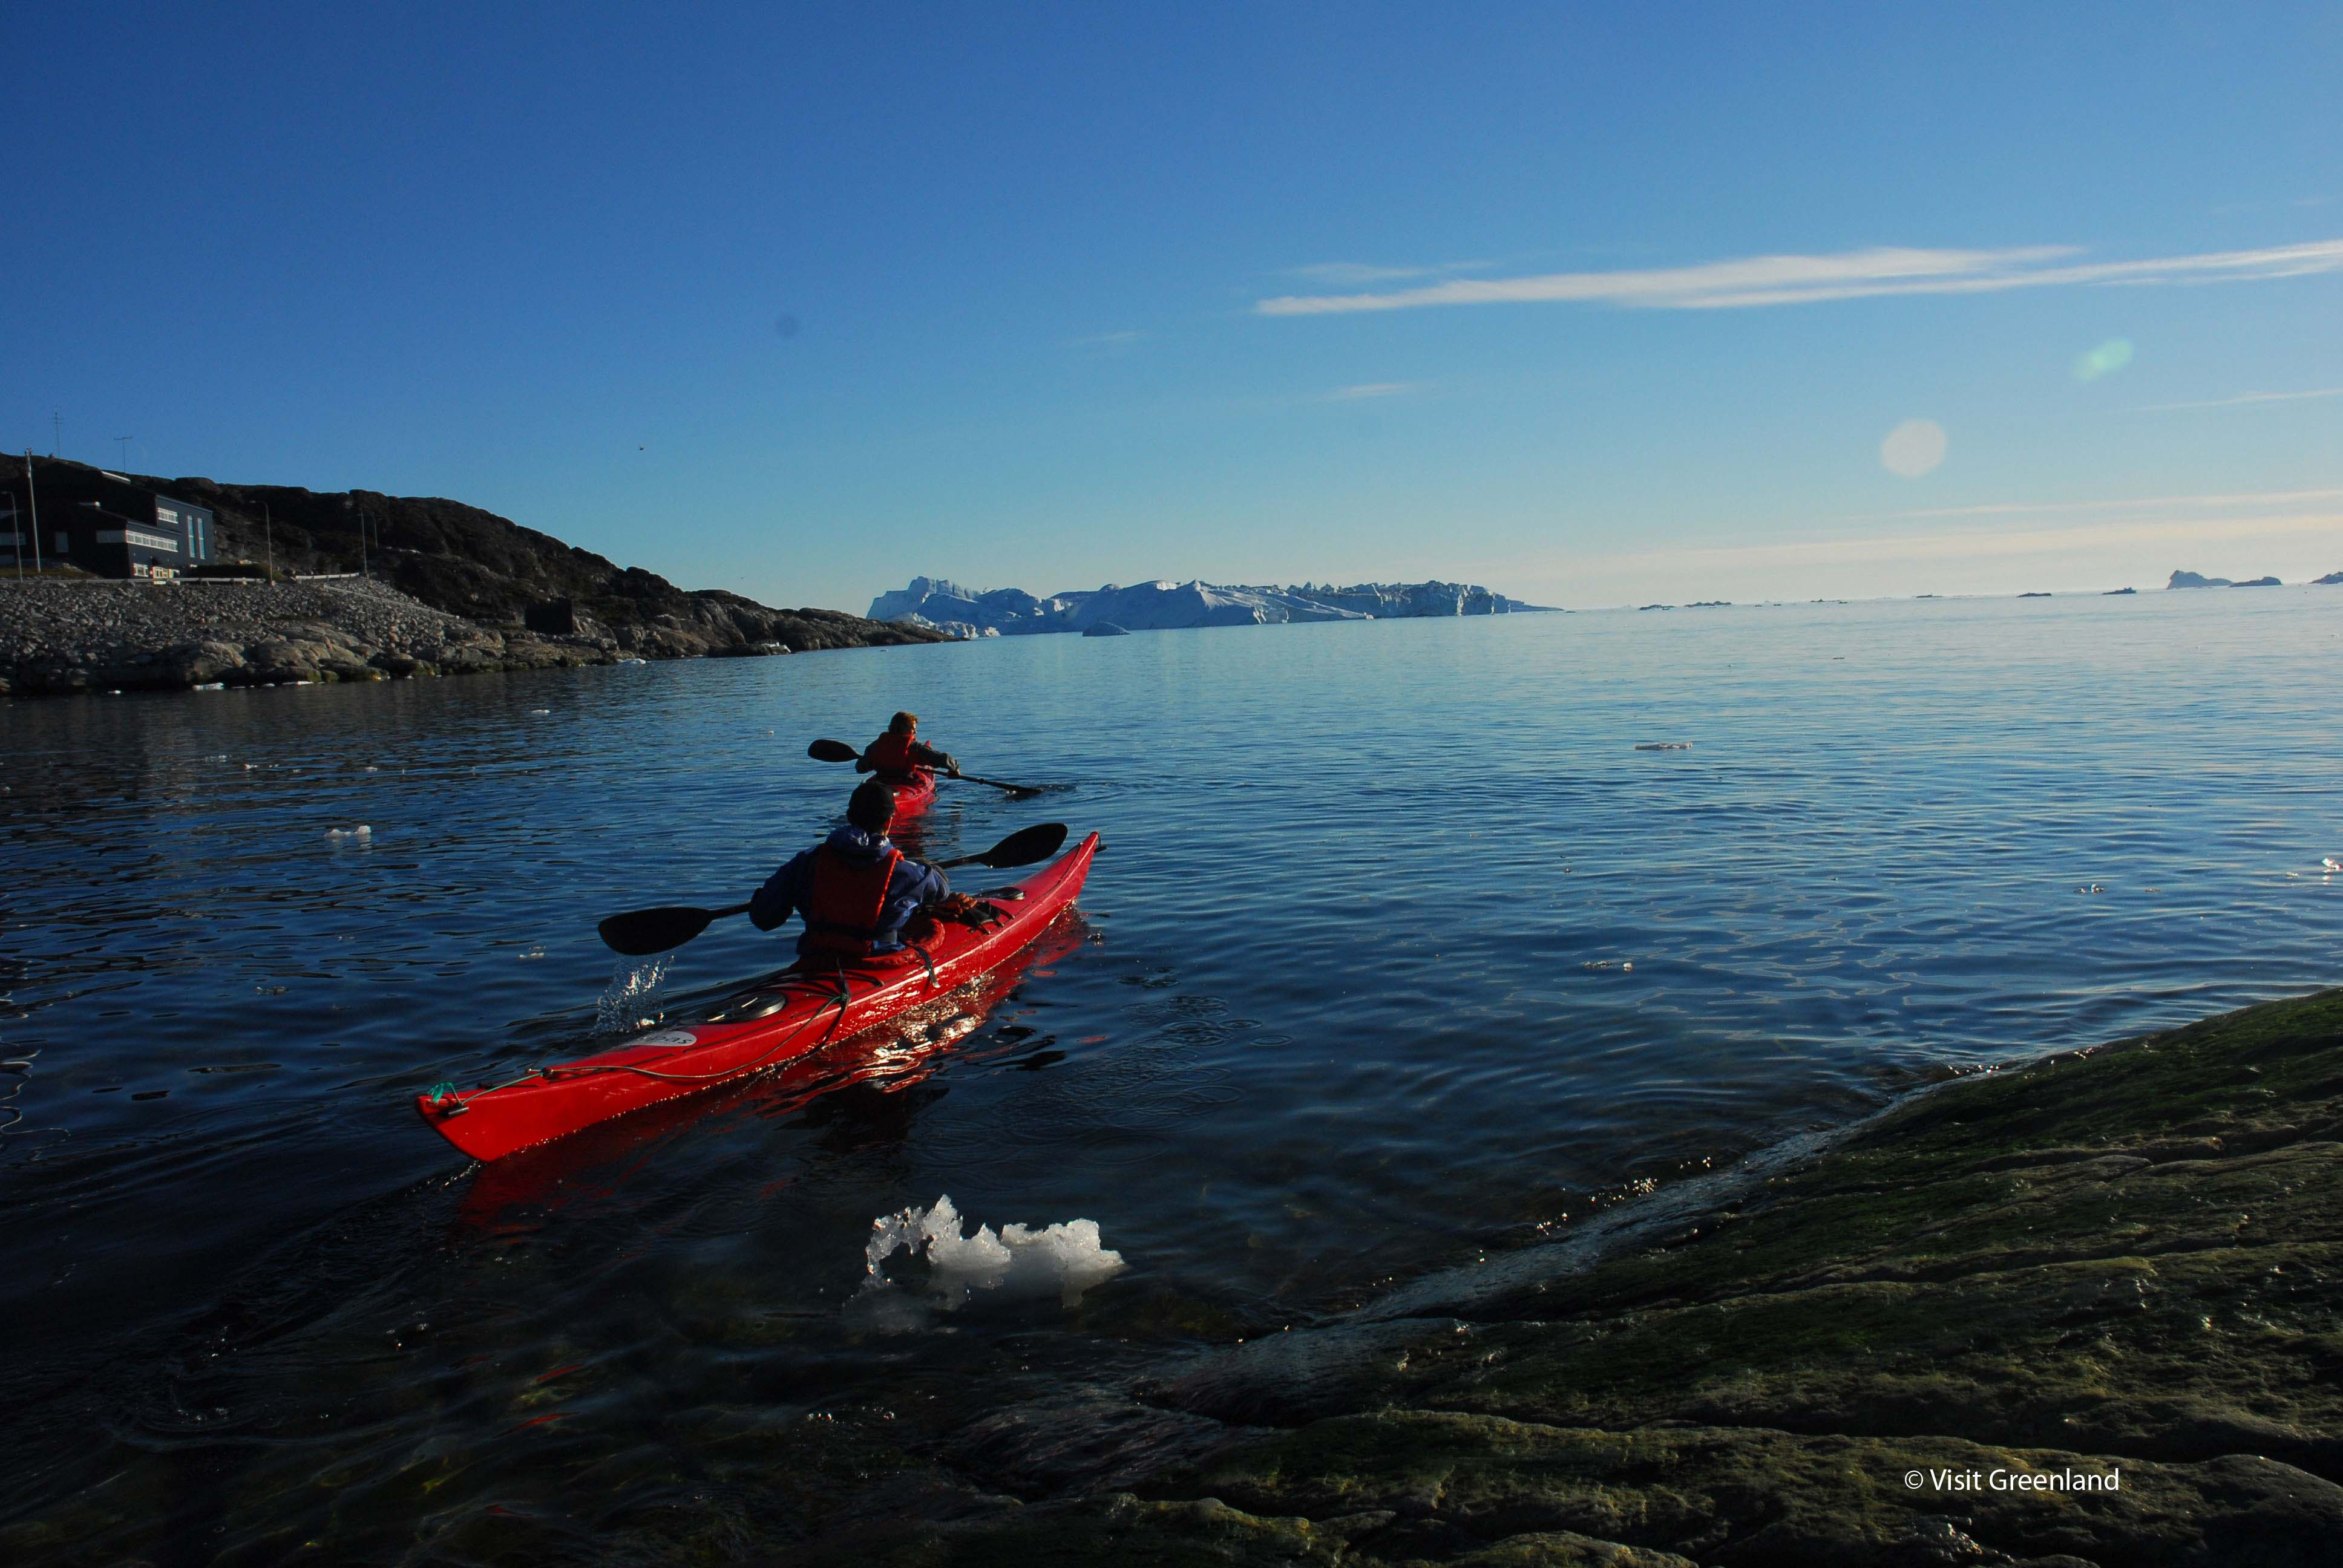 10tage kajaktour in westgr nland von paamiut aus durch den kuannersooq fjord. Black Bedroom Furniture Sets. Home Design Ideas